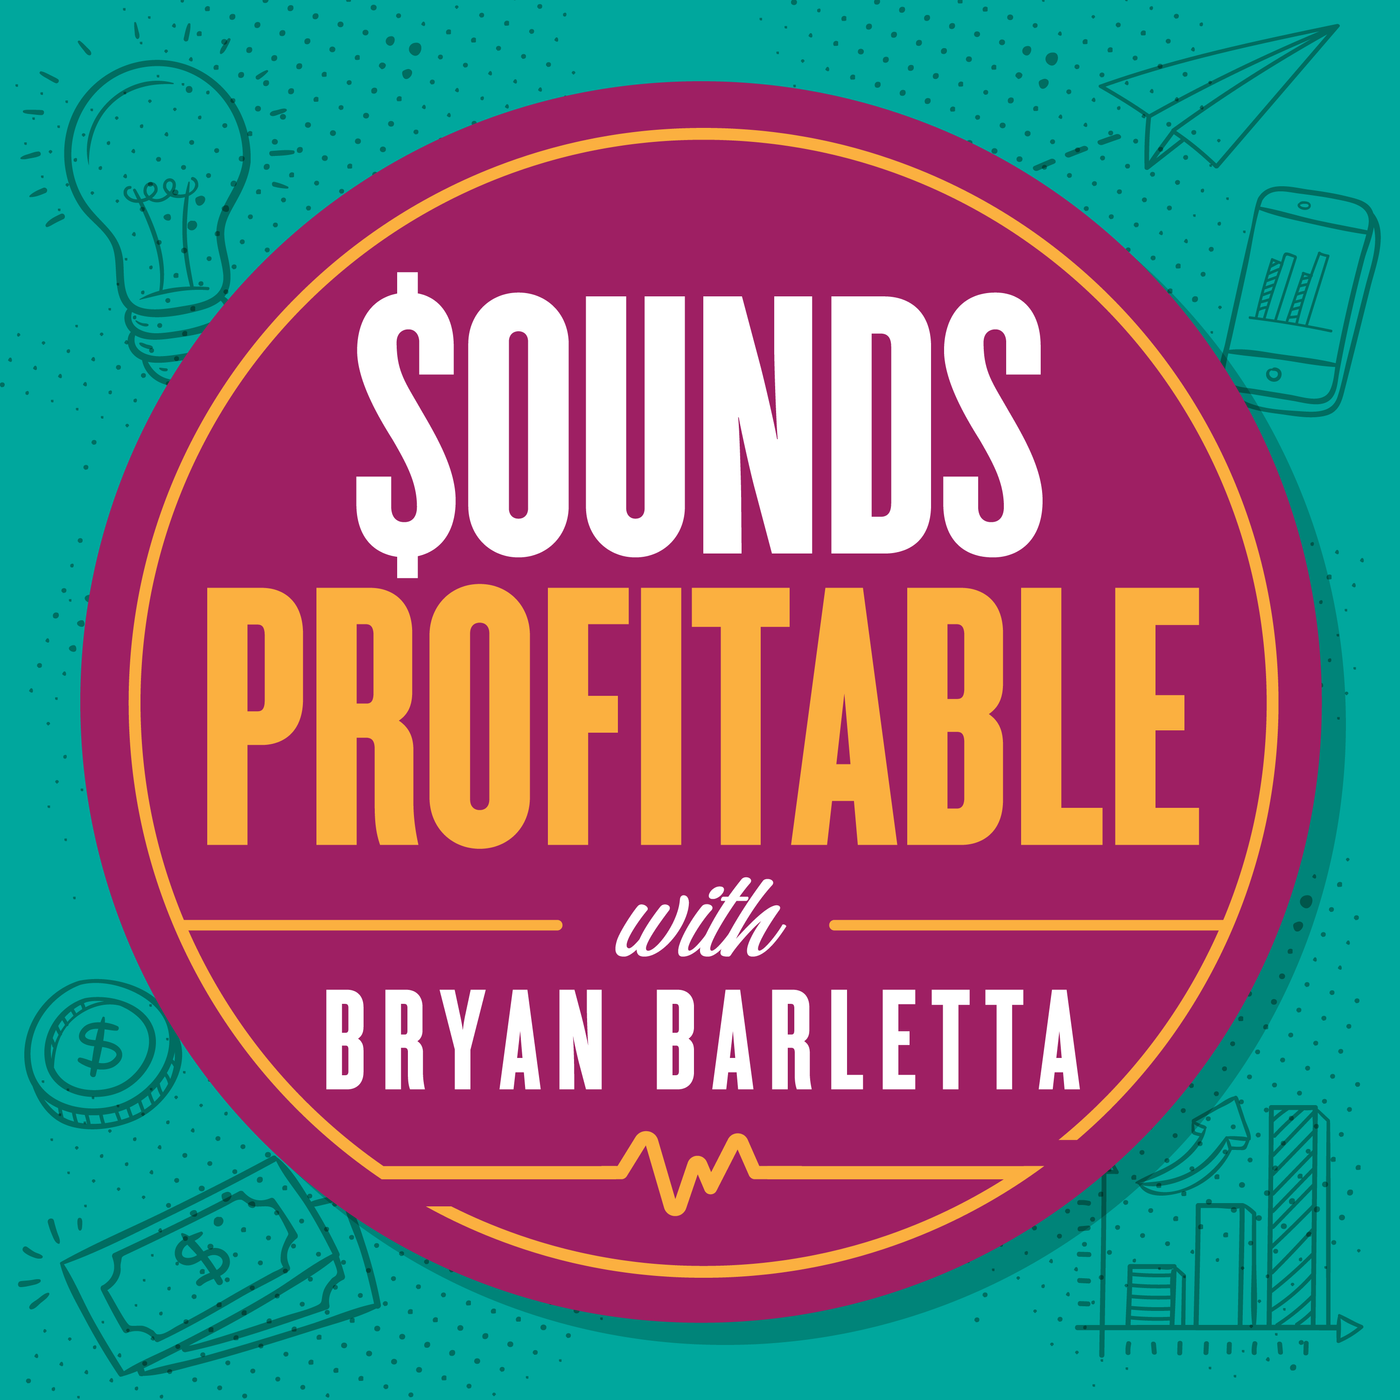 A highlight from Finally Sounds Profitable Has A Podcast w/ Evo Terra